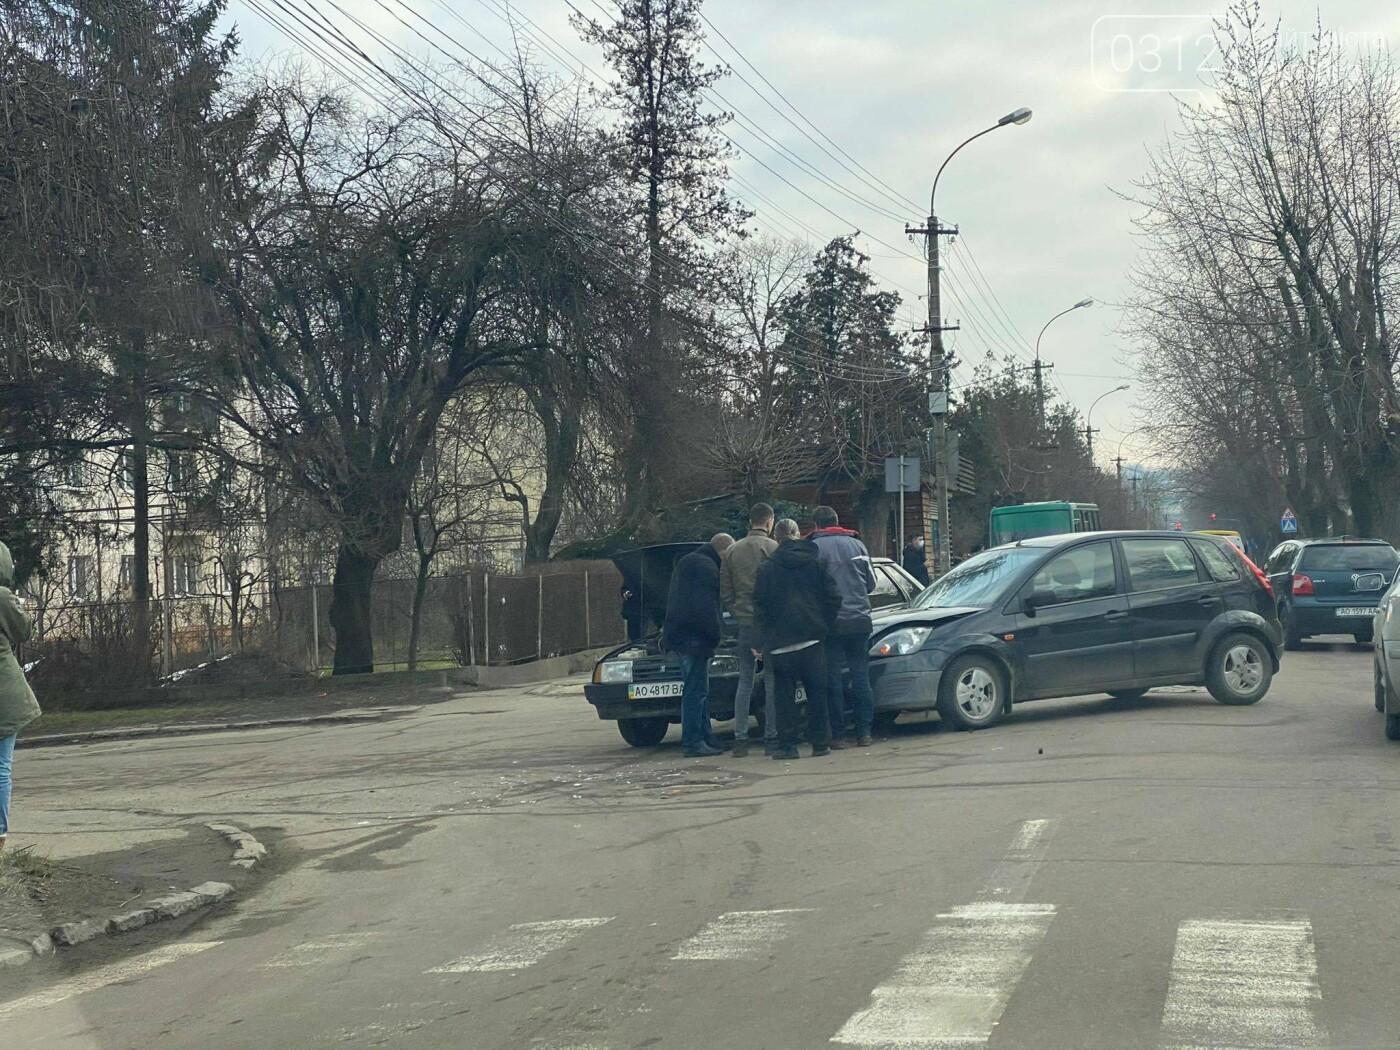 0312.ua / Сайт міста Ужгорода